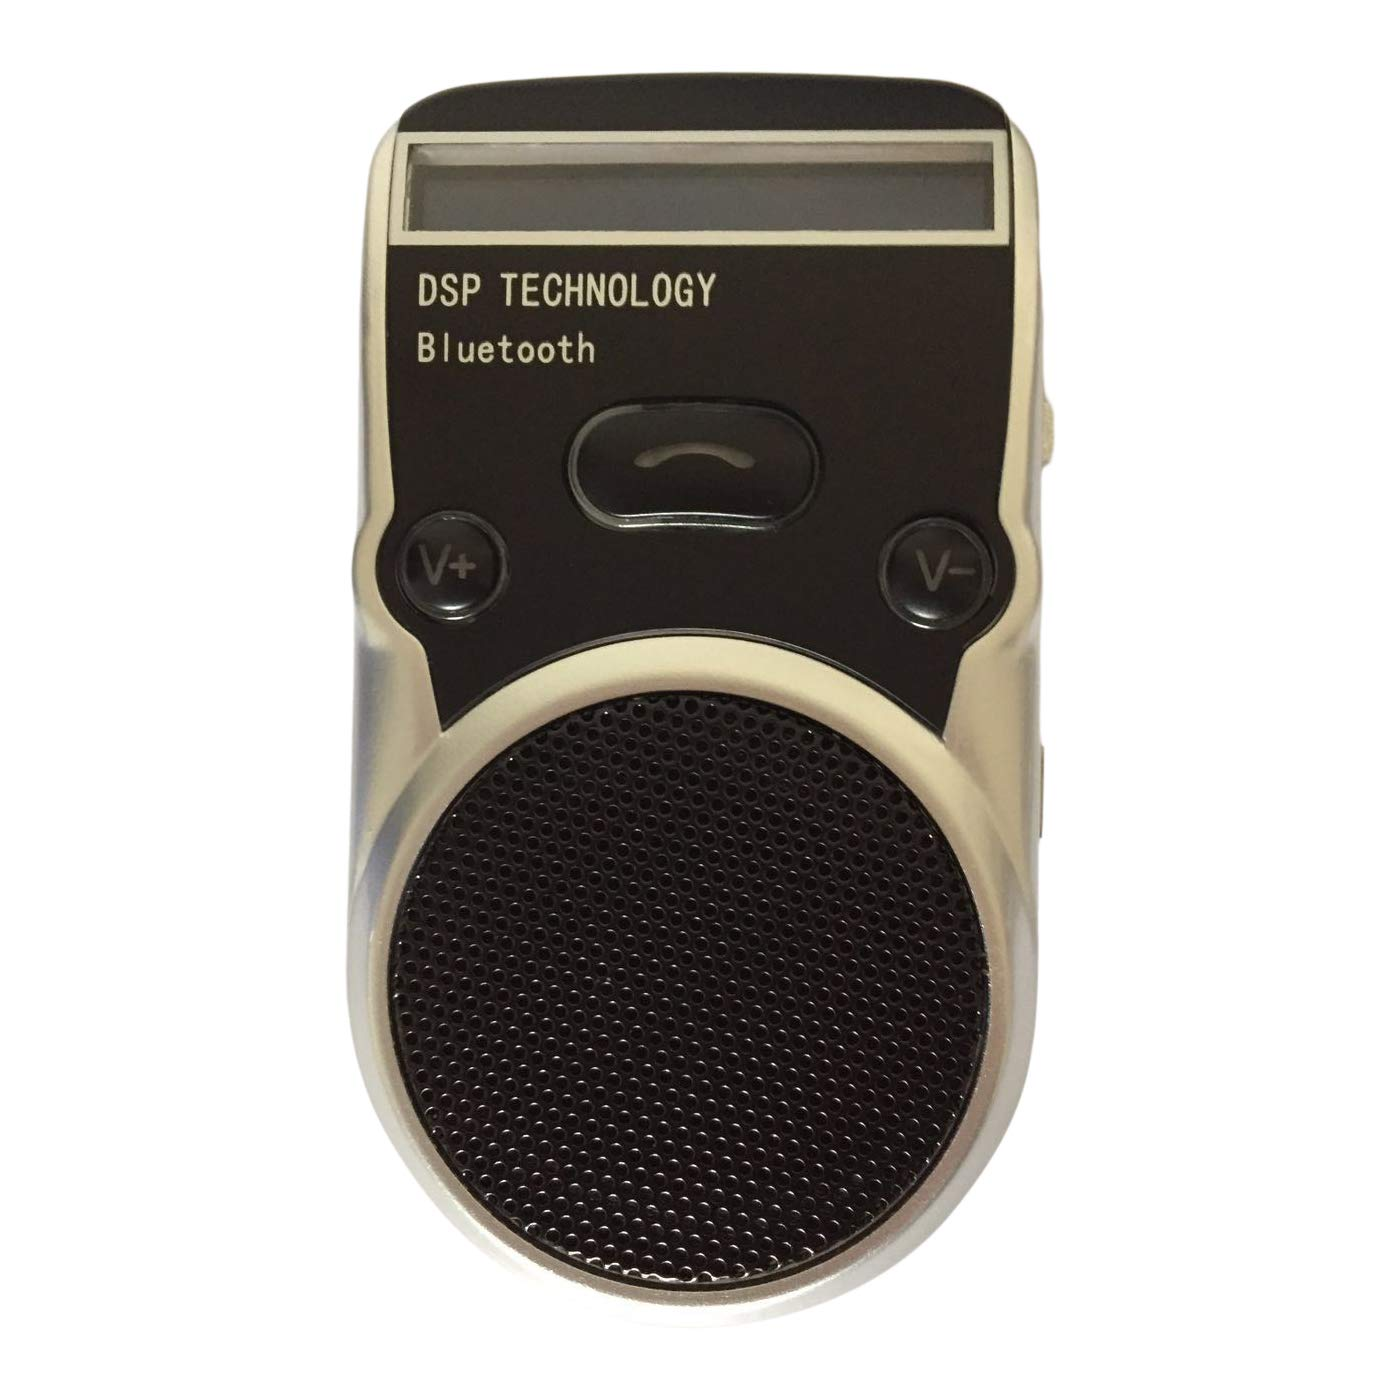 WiseBird ソーラー Bluetooth ハンズフリー 車載電話スピーカー 数字表示付き   B07QCHY8NK